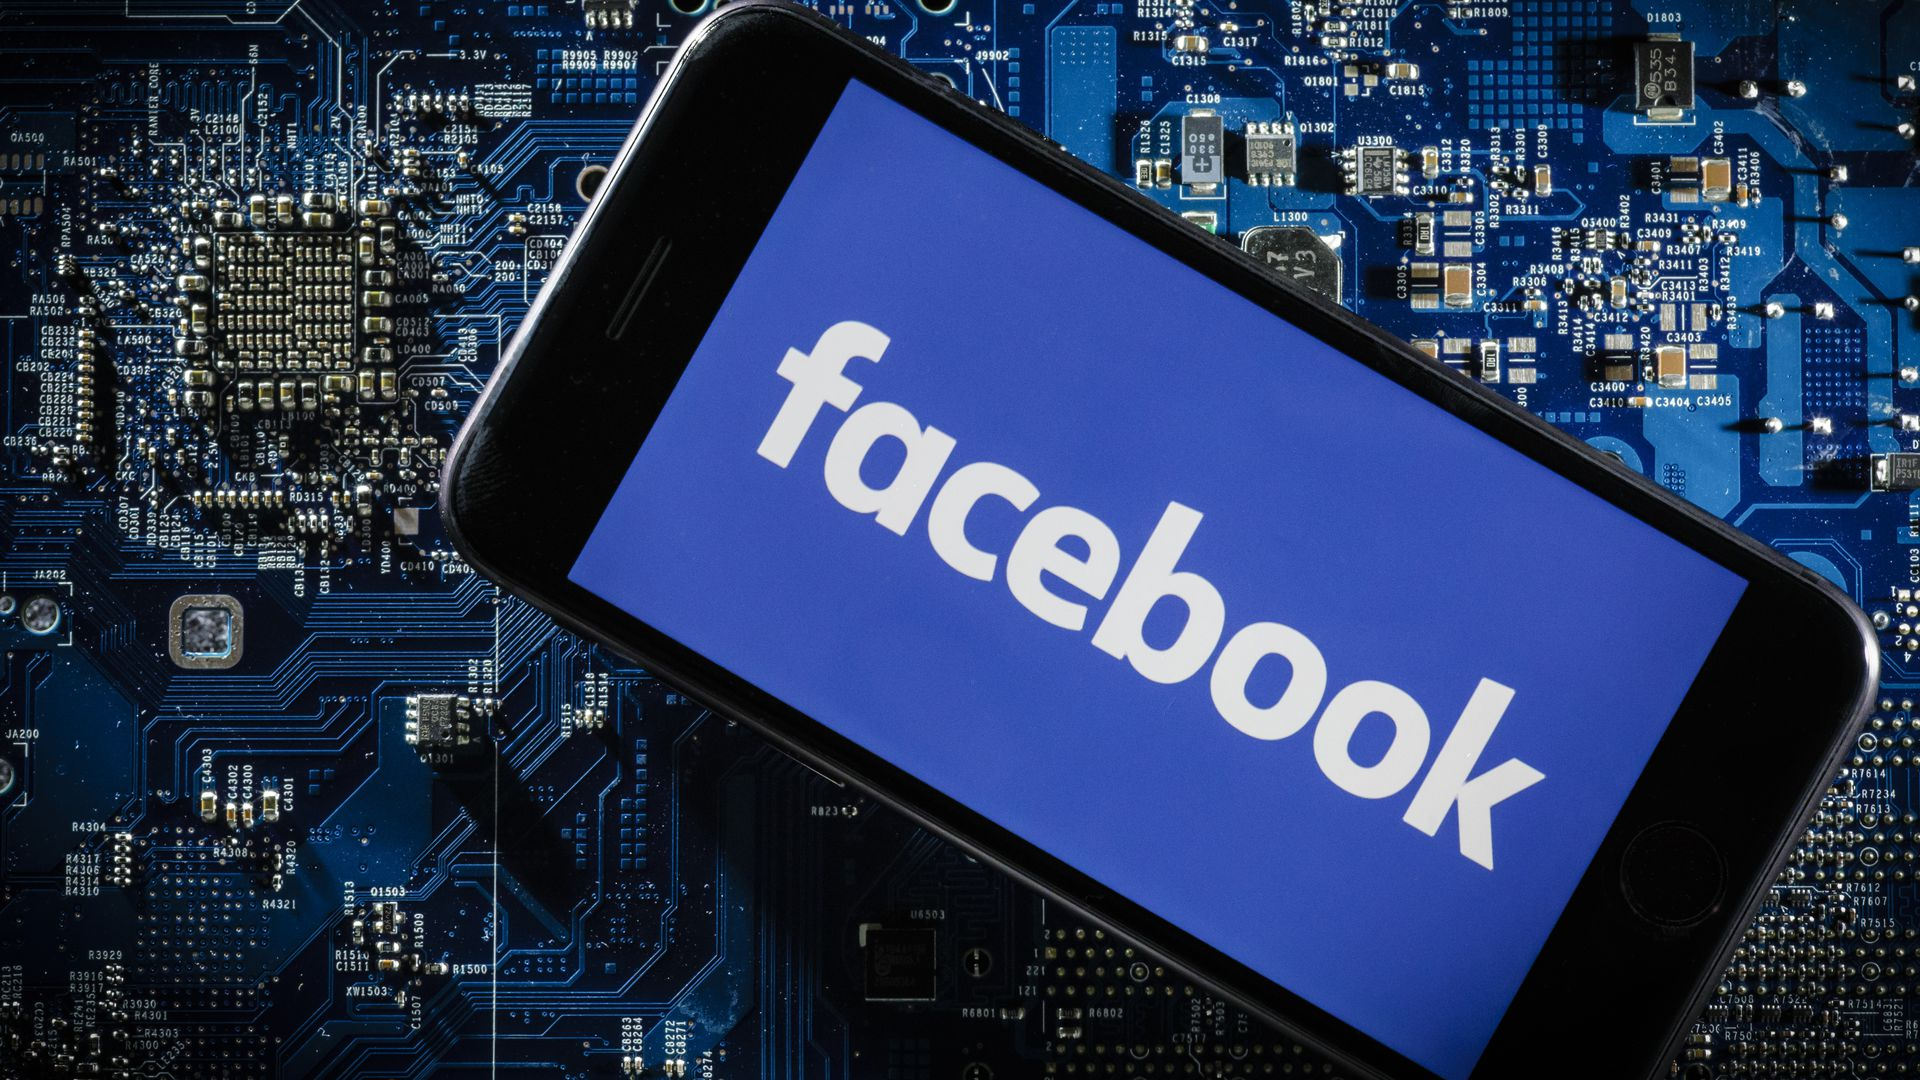 A phone displays the Facebook logo